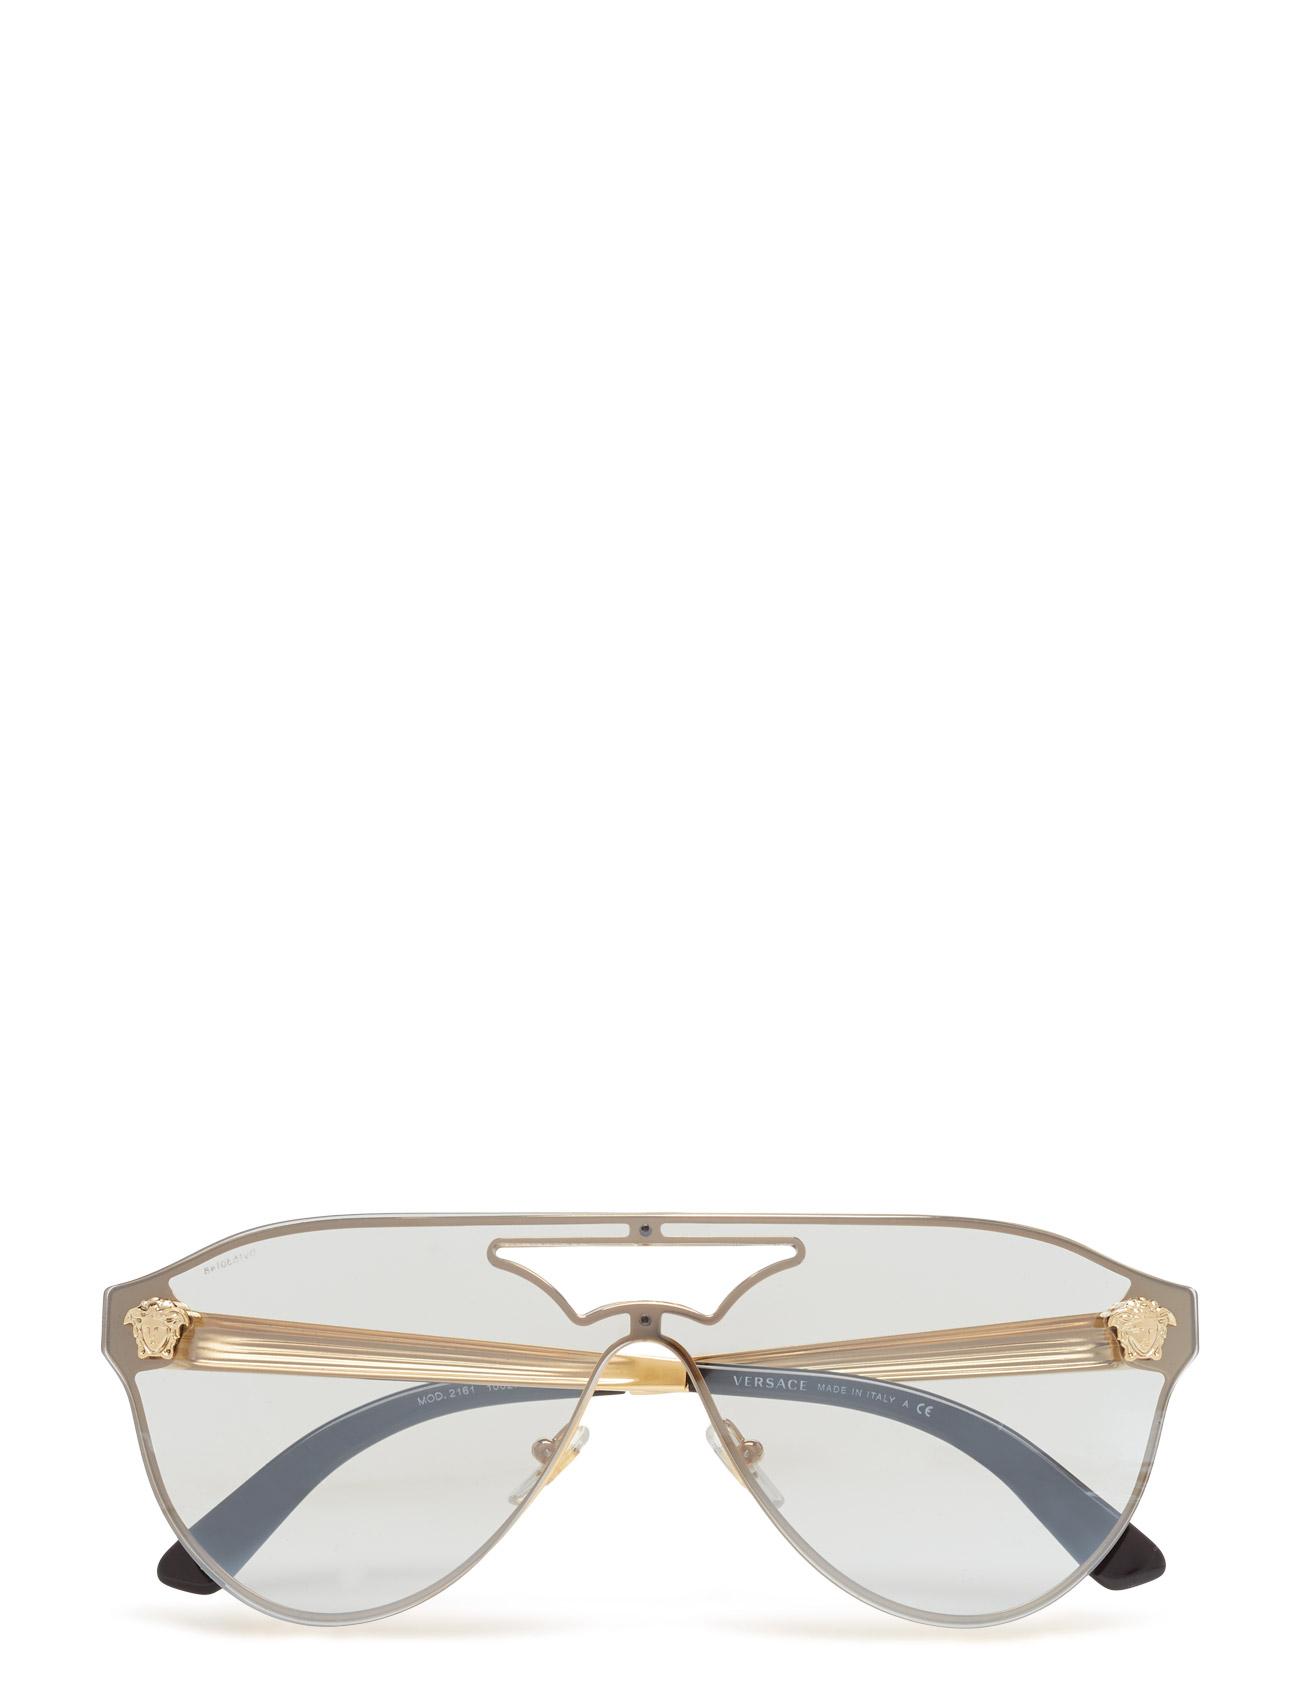 versace sunglasses Rock icons | medusa på boozt.com dk